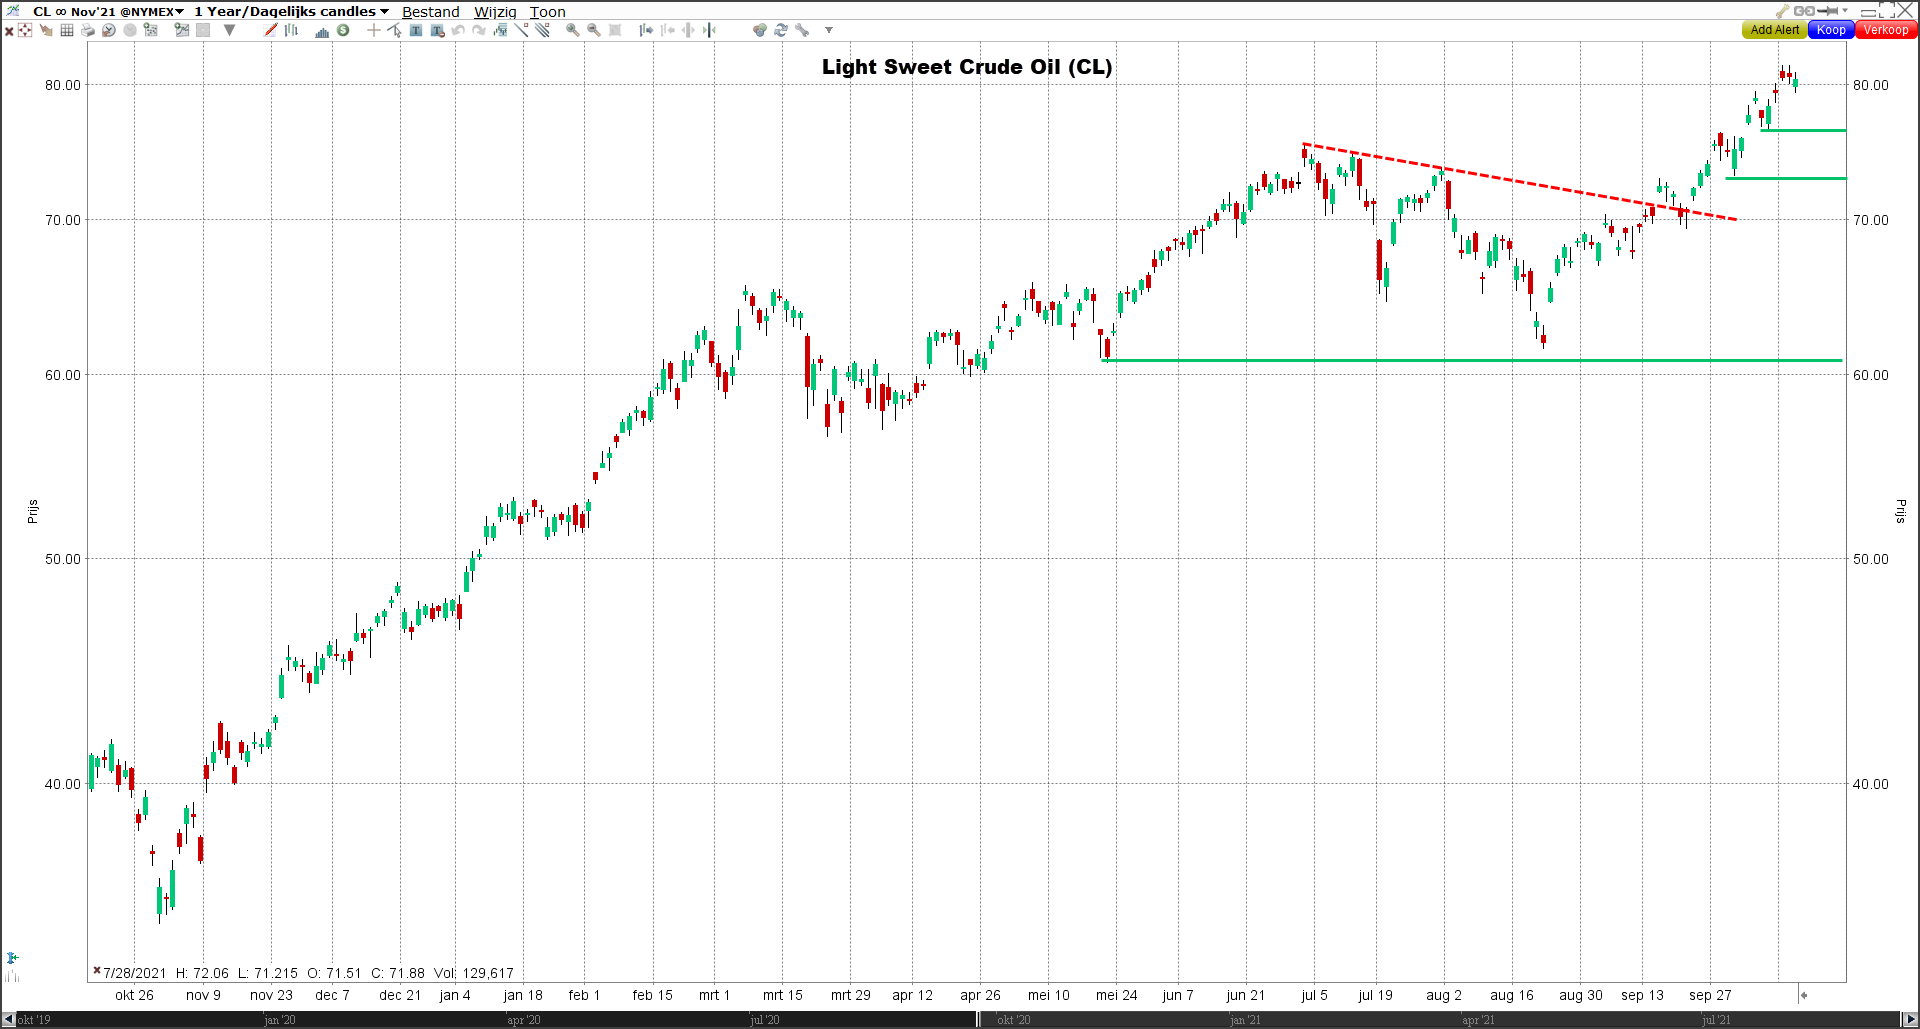 Grafiek Light Sweet Crude Oil (CL)